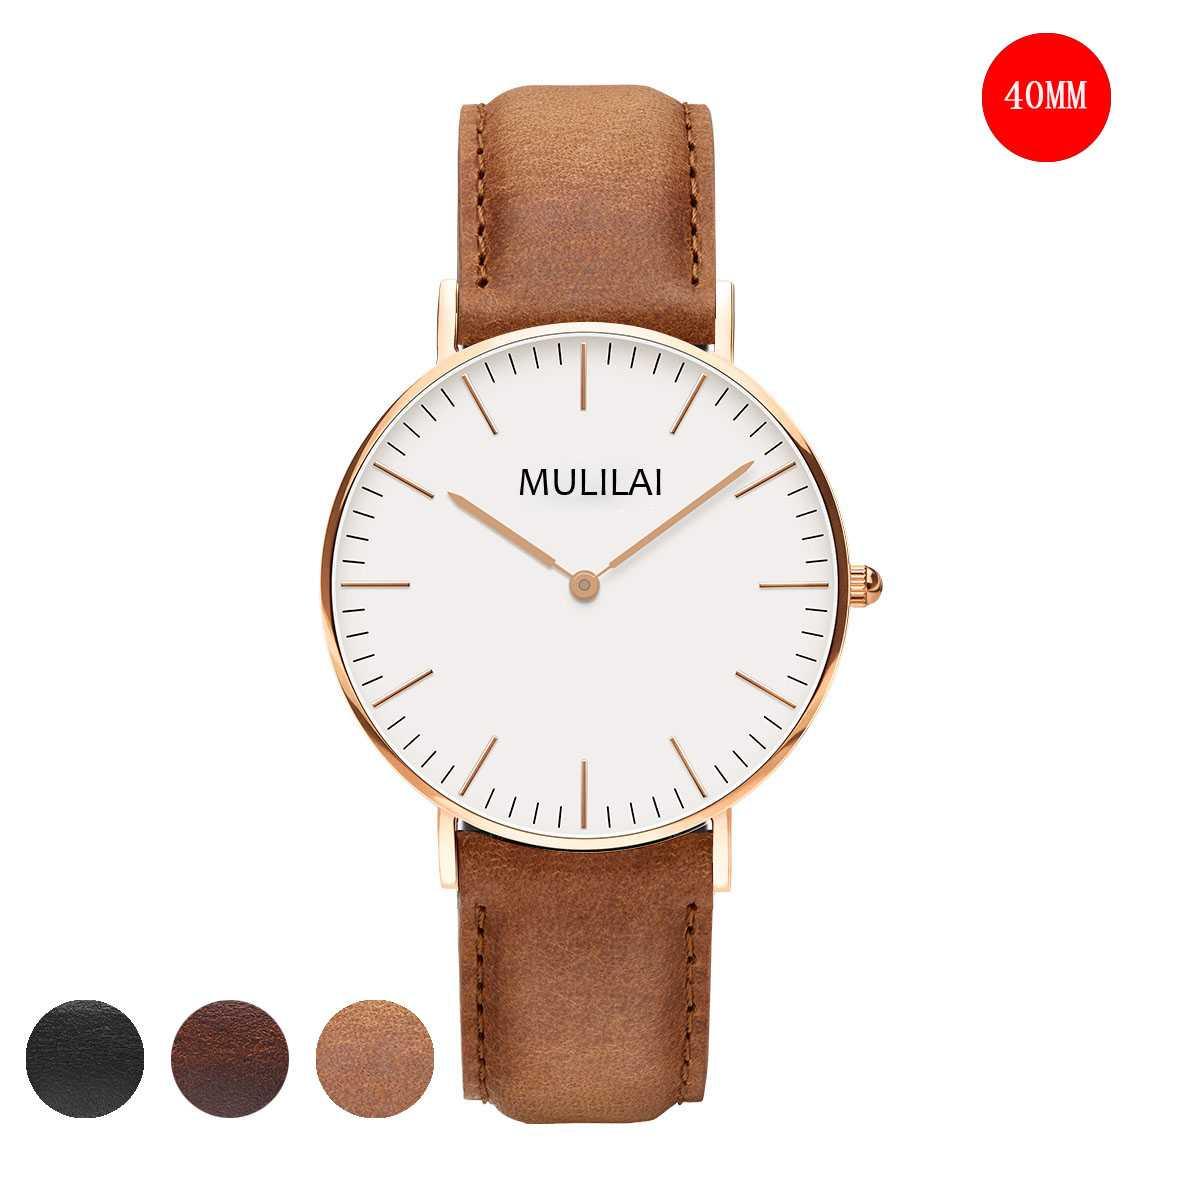 Fashion Men's Watch Brand Luxury 40MM DW watch Style Quartz watch Rose Gold leather strap Watches Reloj Hombre Relogio Masculino lg watch style w270 rose gold